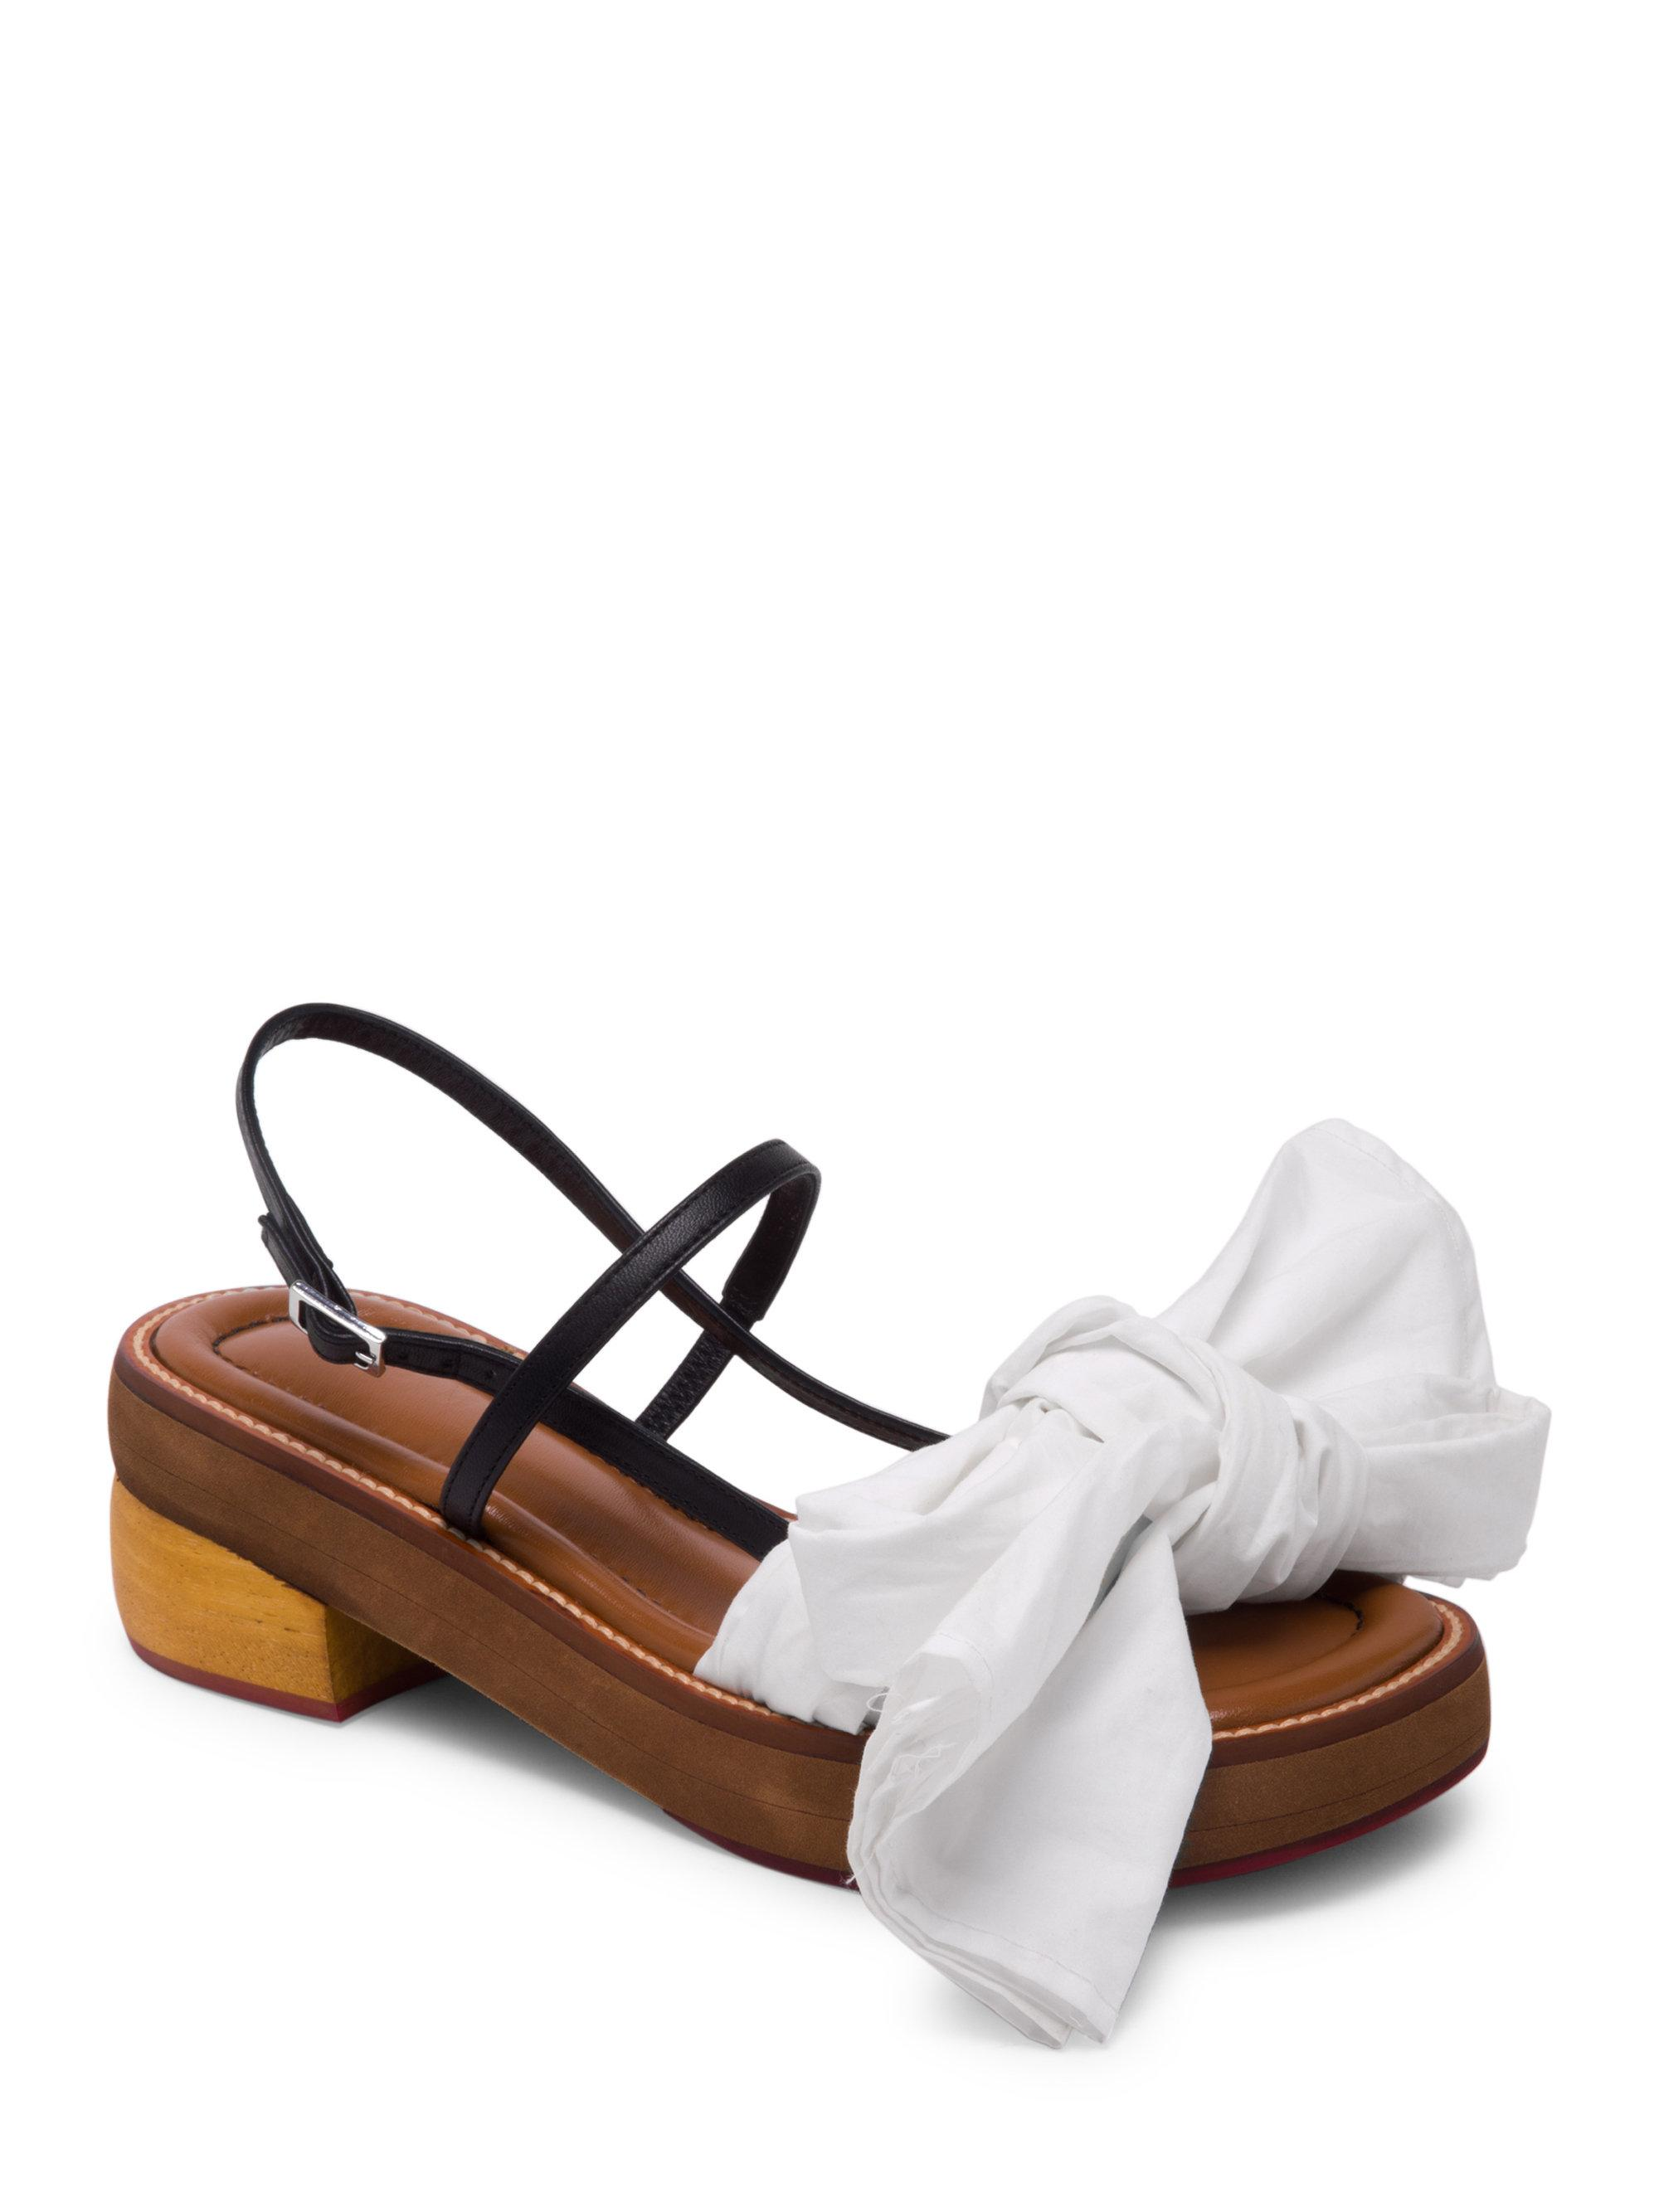 Marni Fabric bow sandals inbV4VE0FB